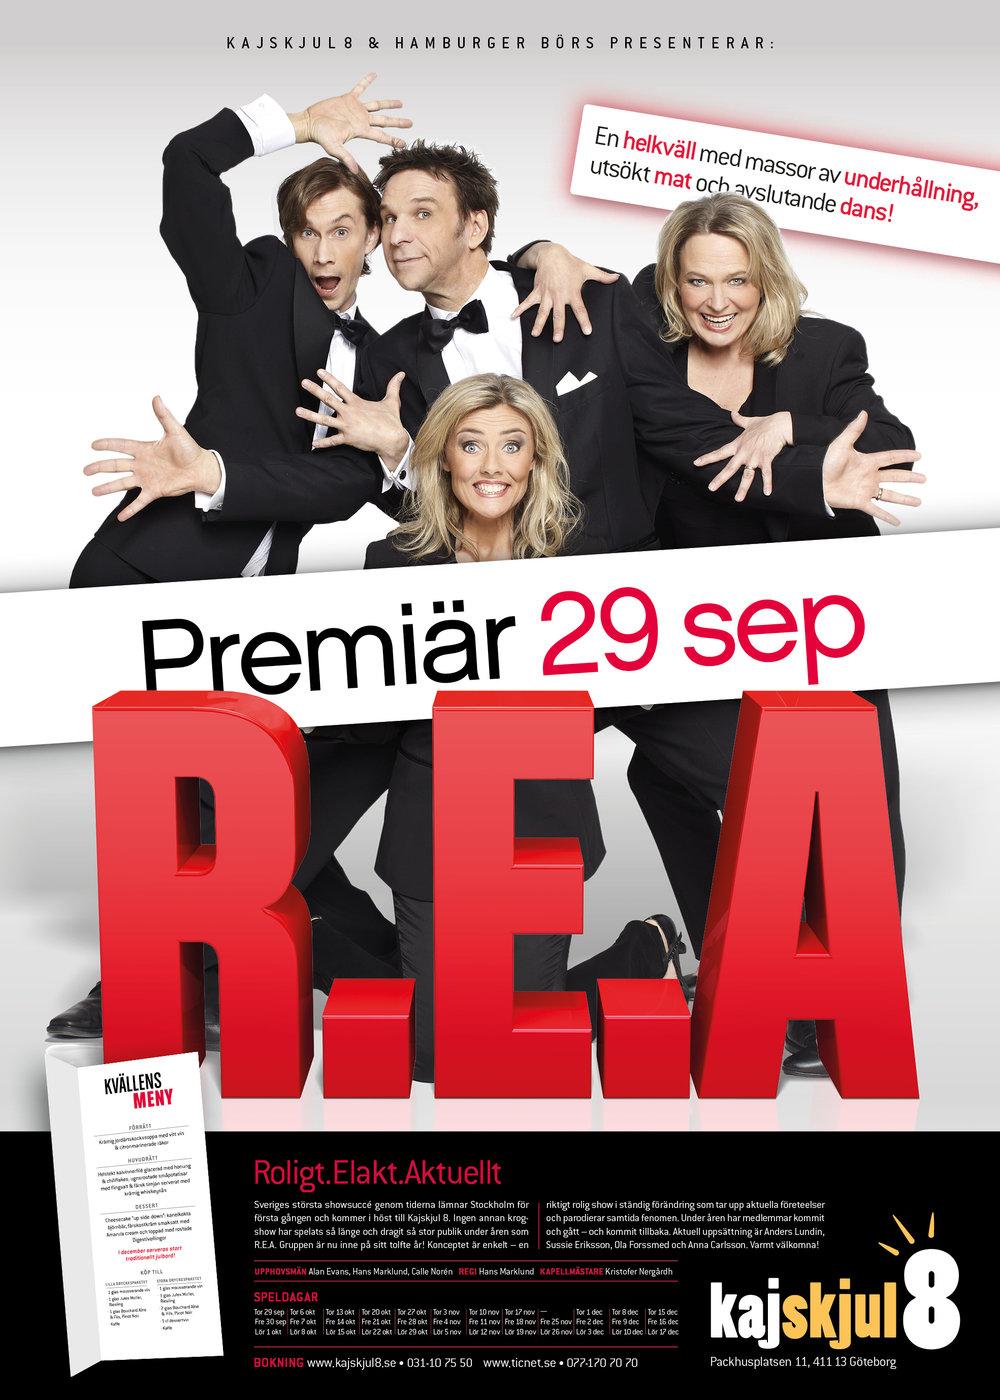 REA-1-Poster-50x70mm-high-premiar-03.jpg